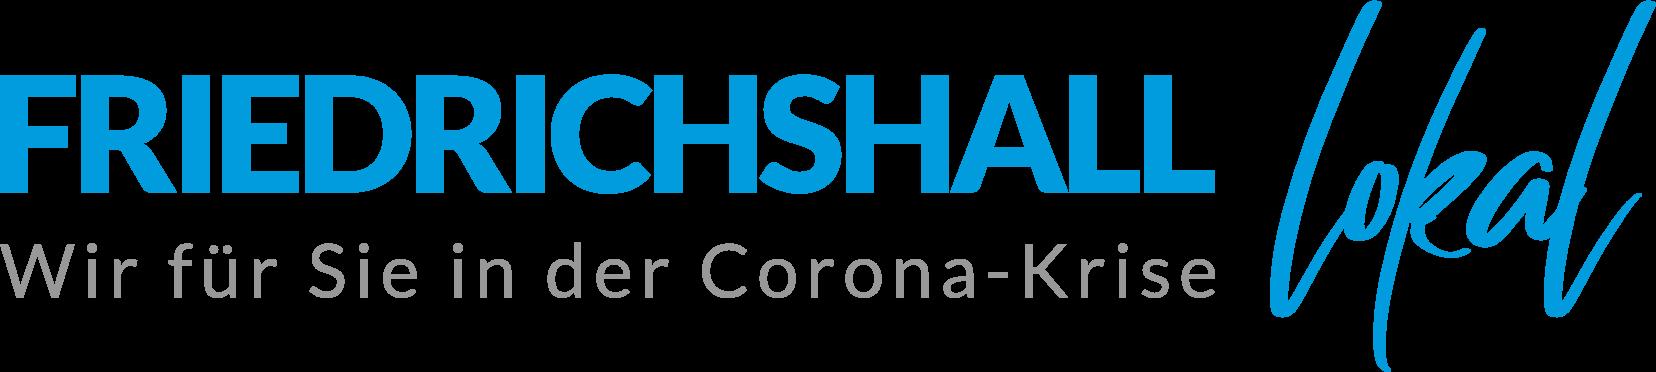 hgv_friedrichshall_lokal_logo